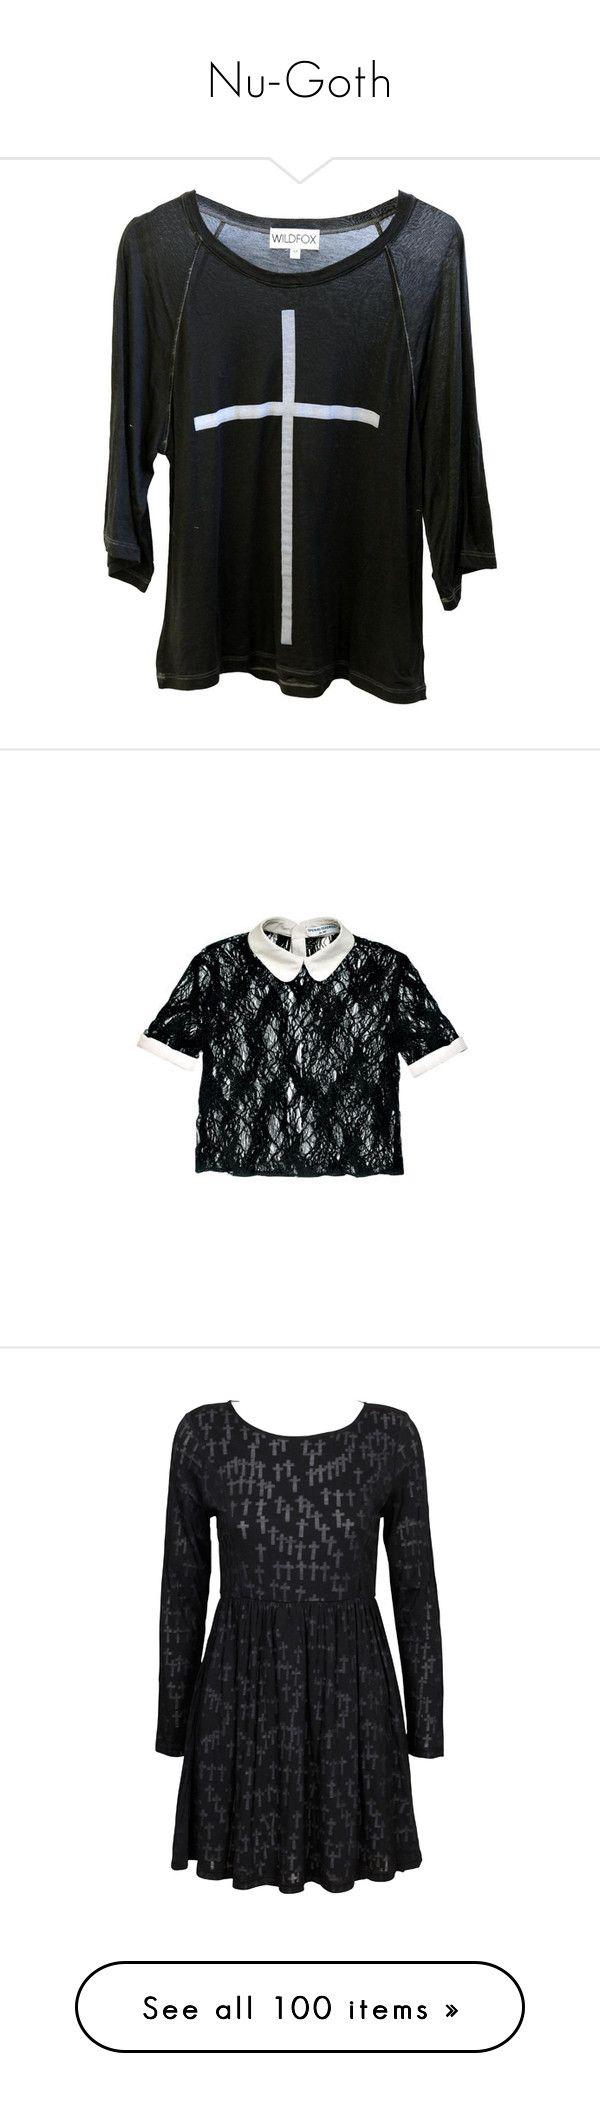 """Nu-Goth"" by punkhale ❤ liked on Polyvore featuring tops, t-shirts, shirts, sweaters, raglan t shirts, cross shirt, raglan sleeve t shirts, over sized shirts, raglan shirts and blouses"